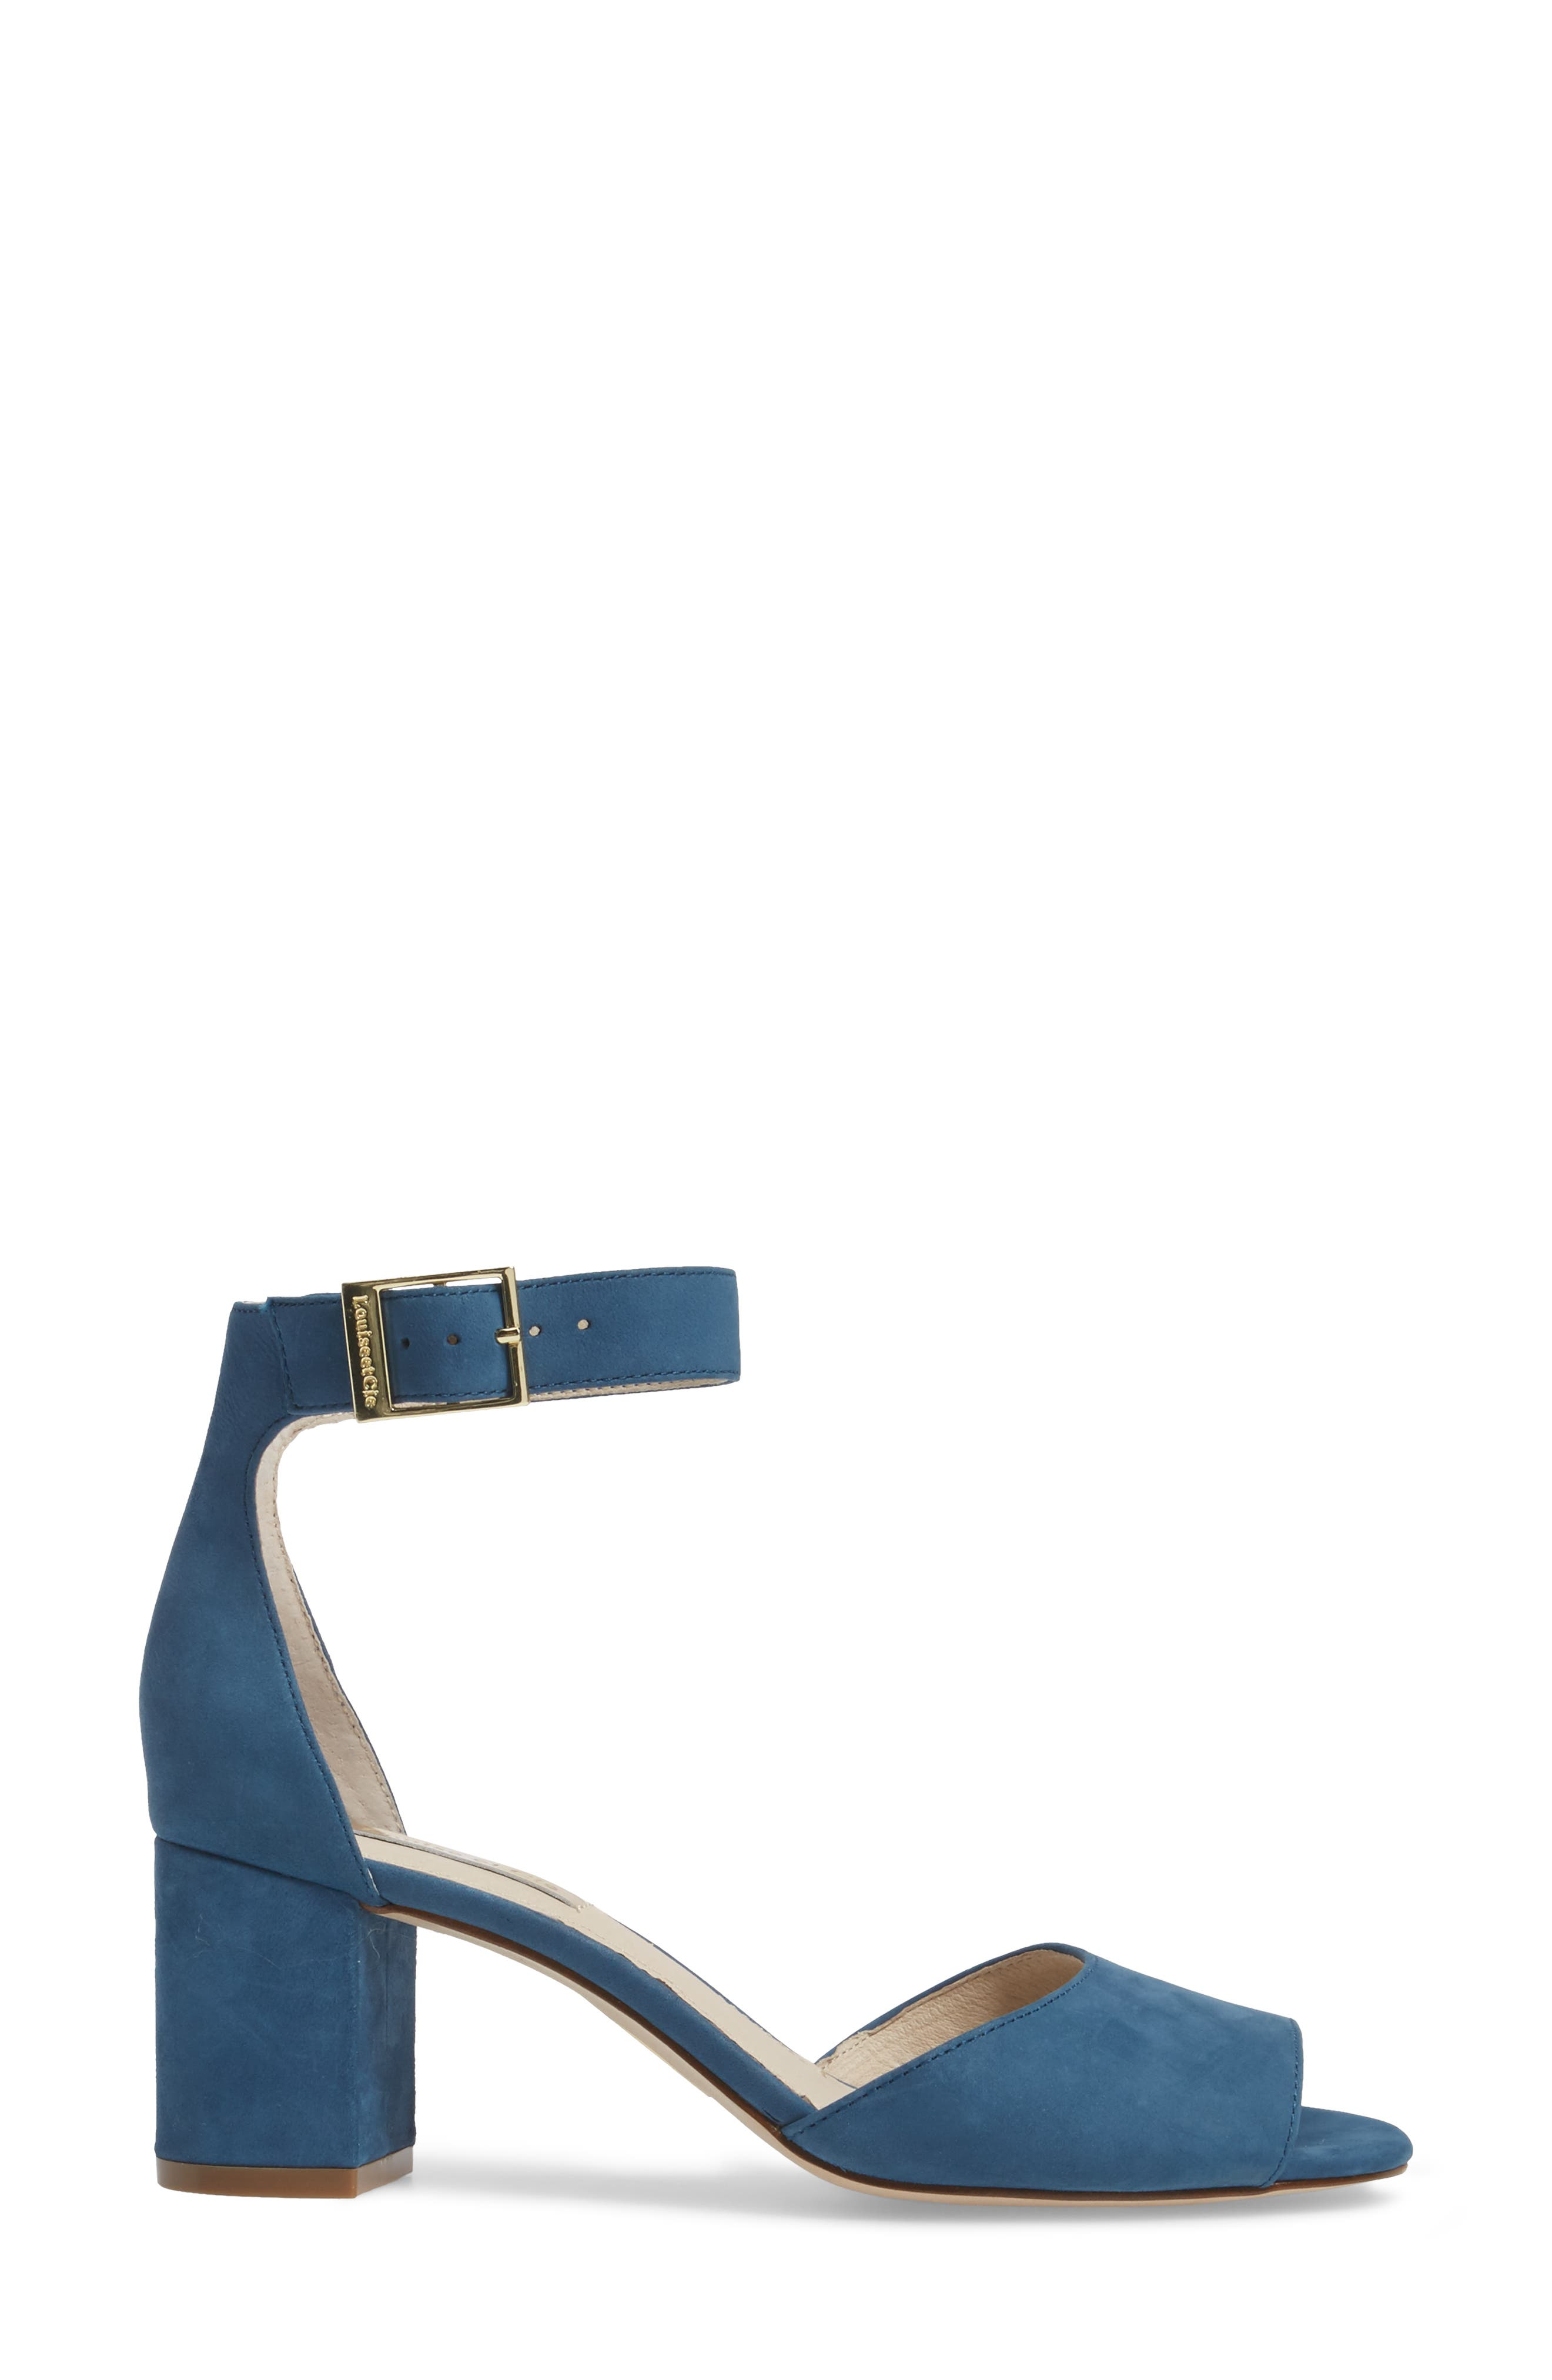 Alternate Image 3  - Louise et Cie Karisa Ankle Cuff Sandal (Women)